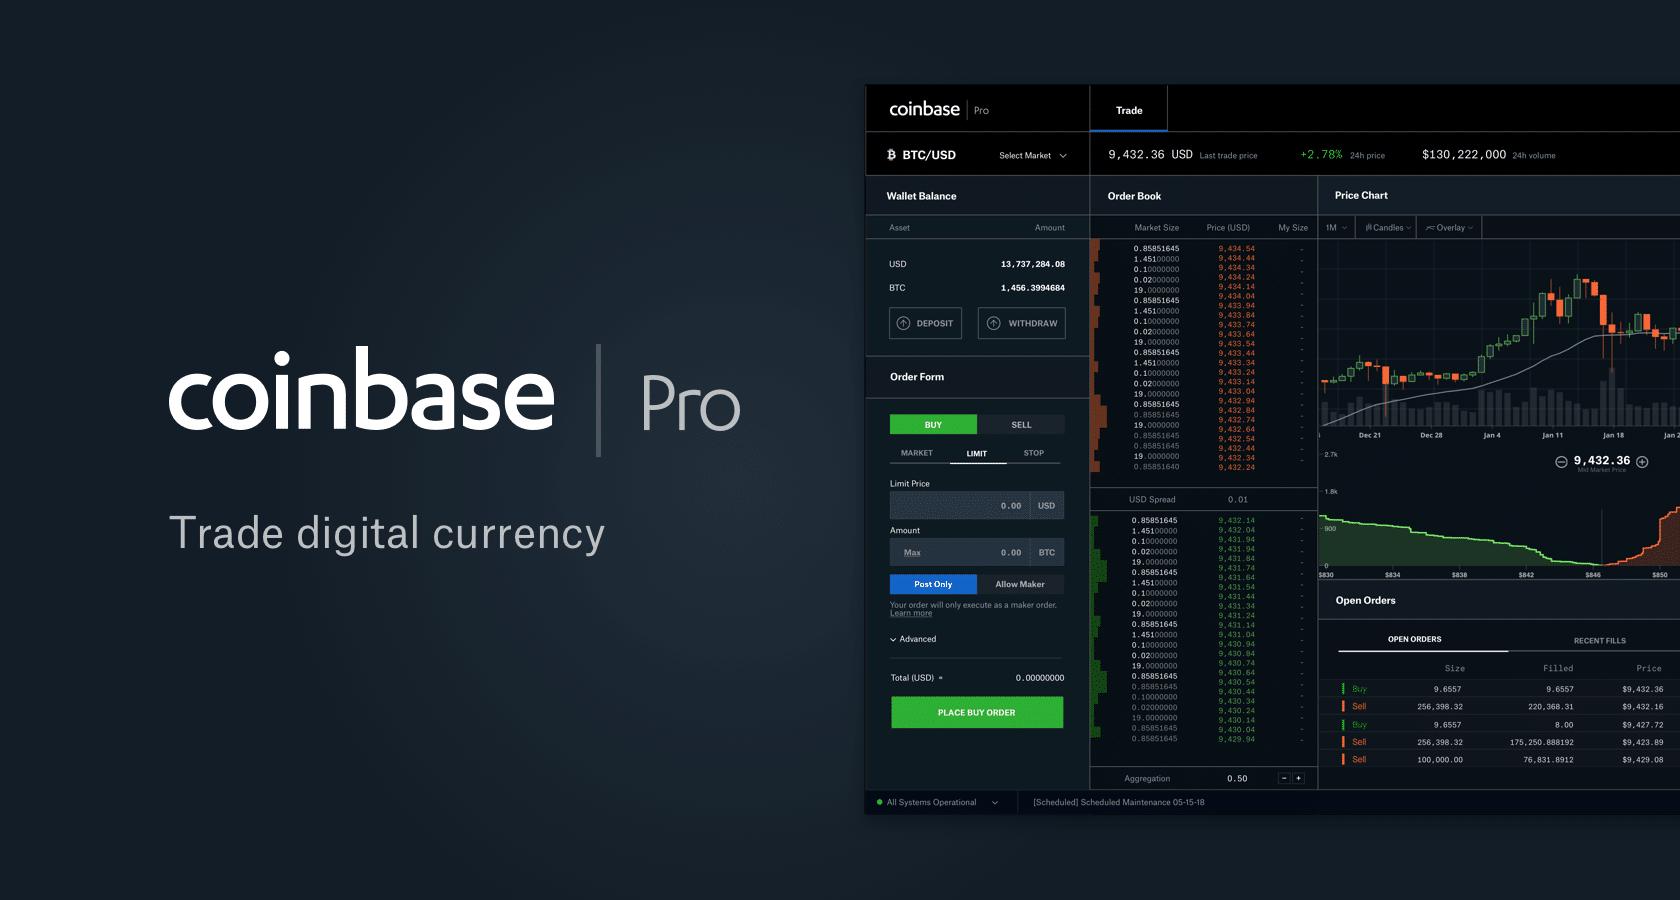 Universal Market Access (UMA) lands on Coinbase Pro